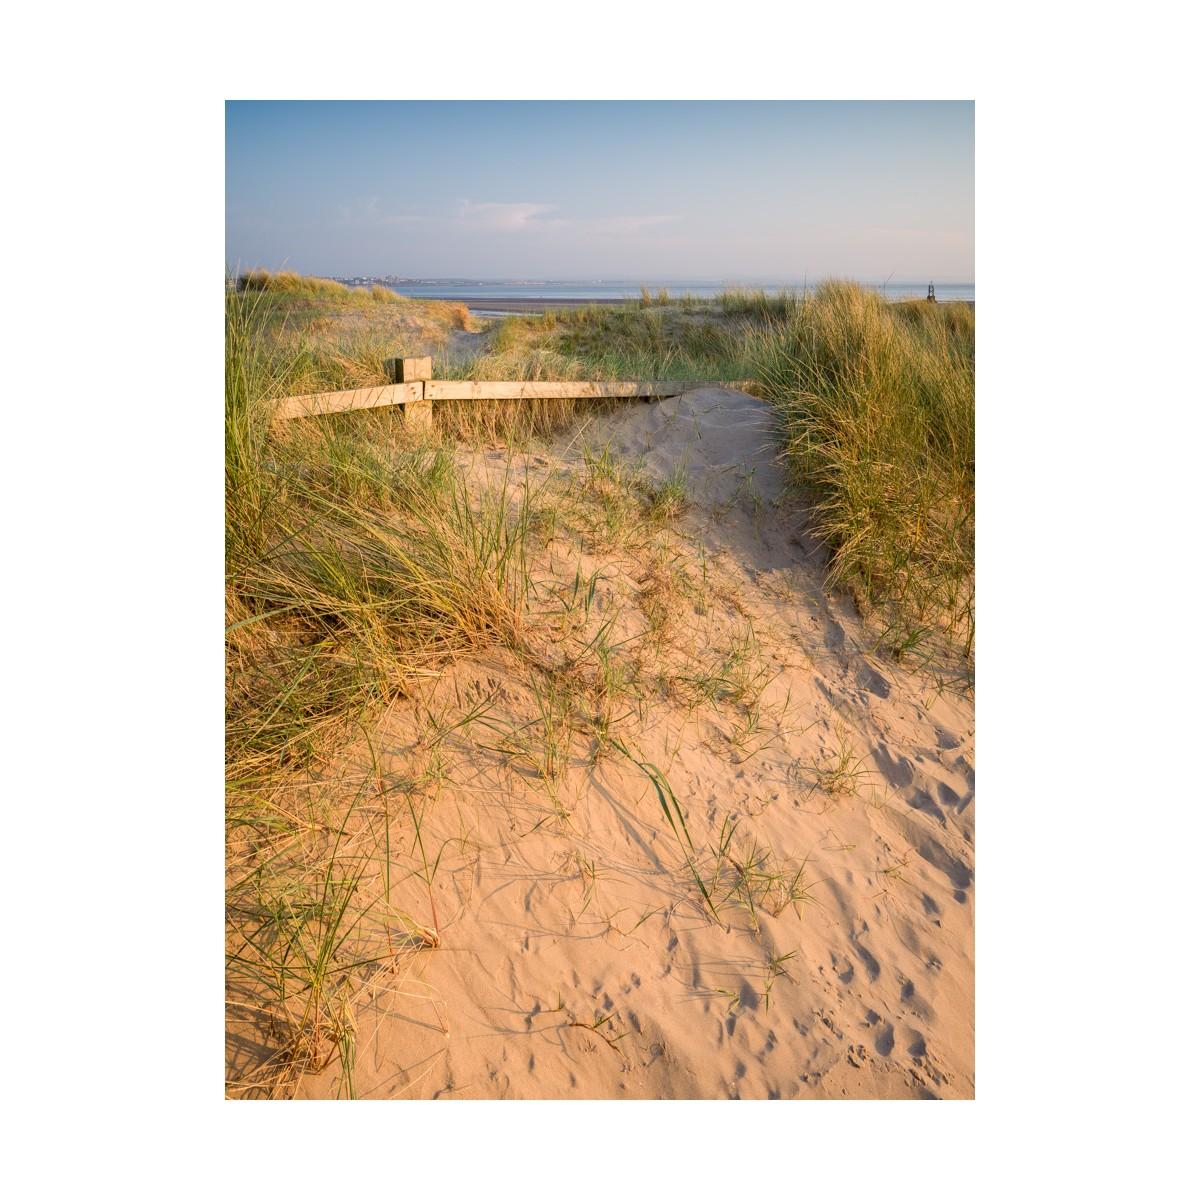 Crosby Dunes